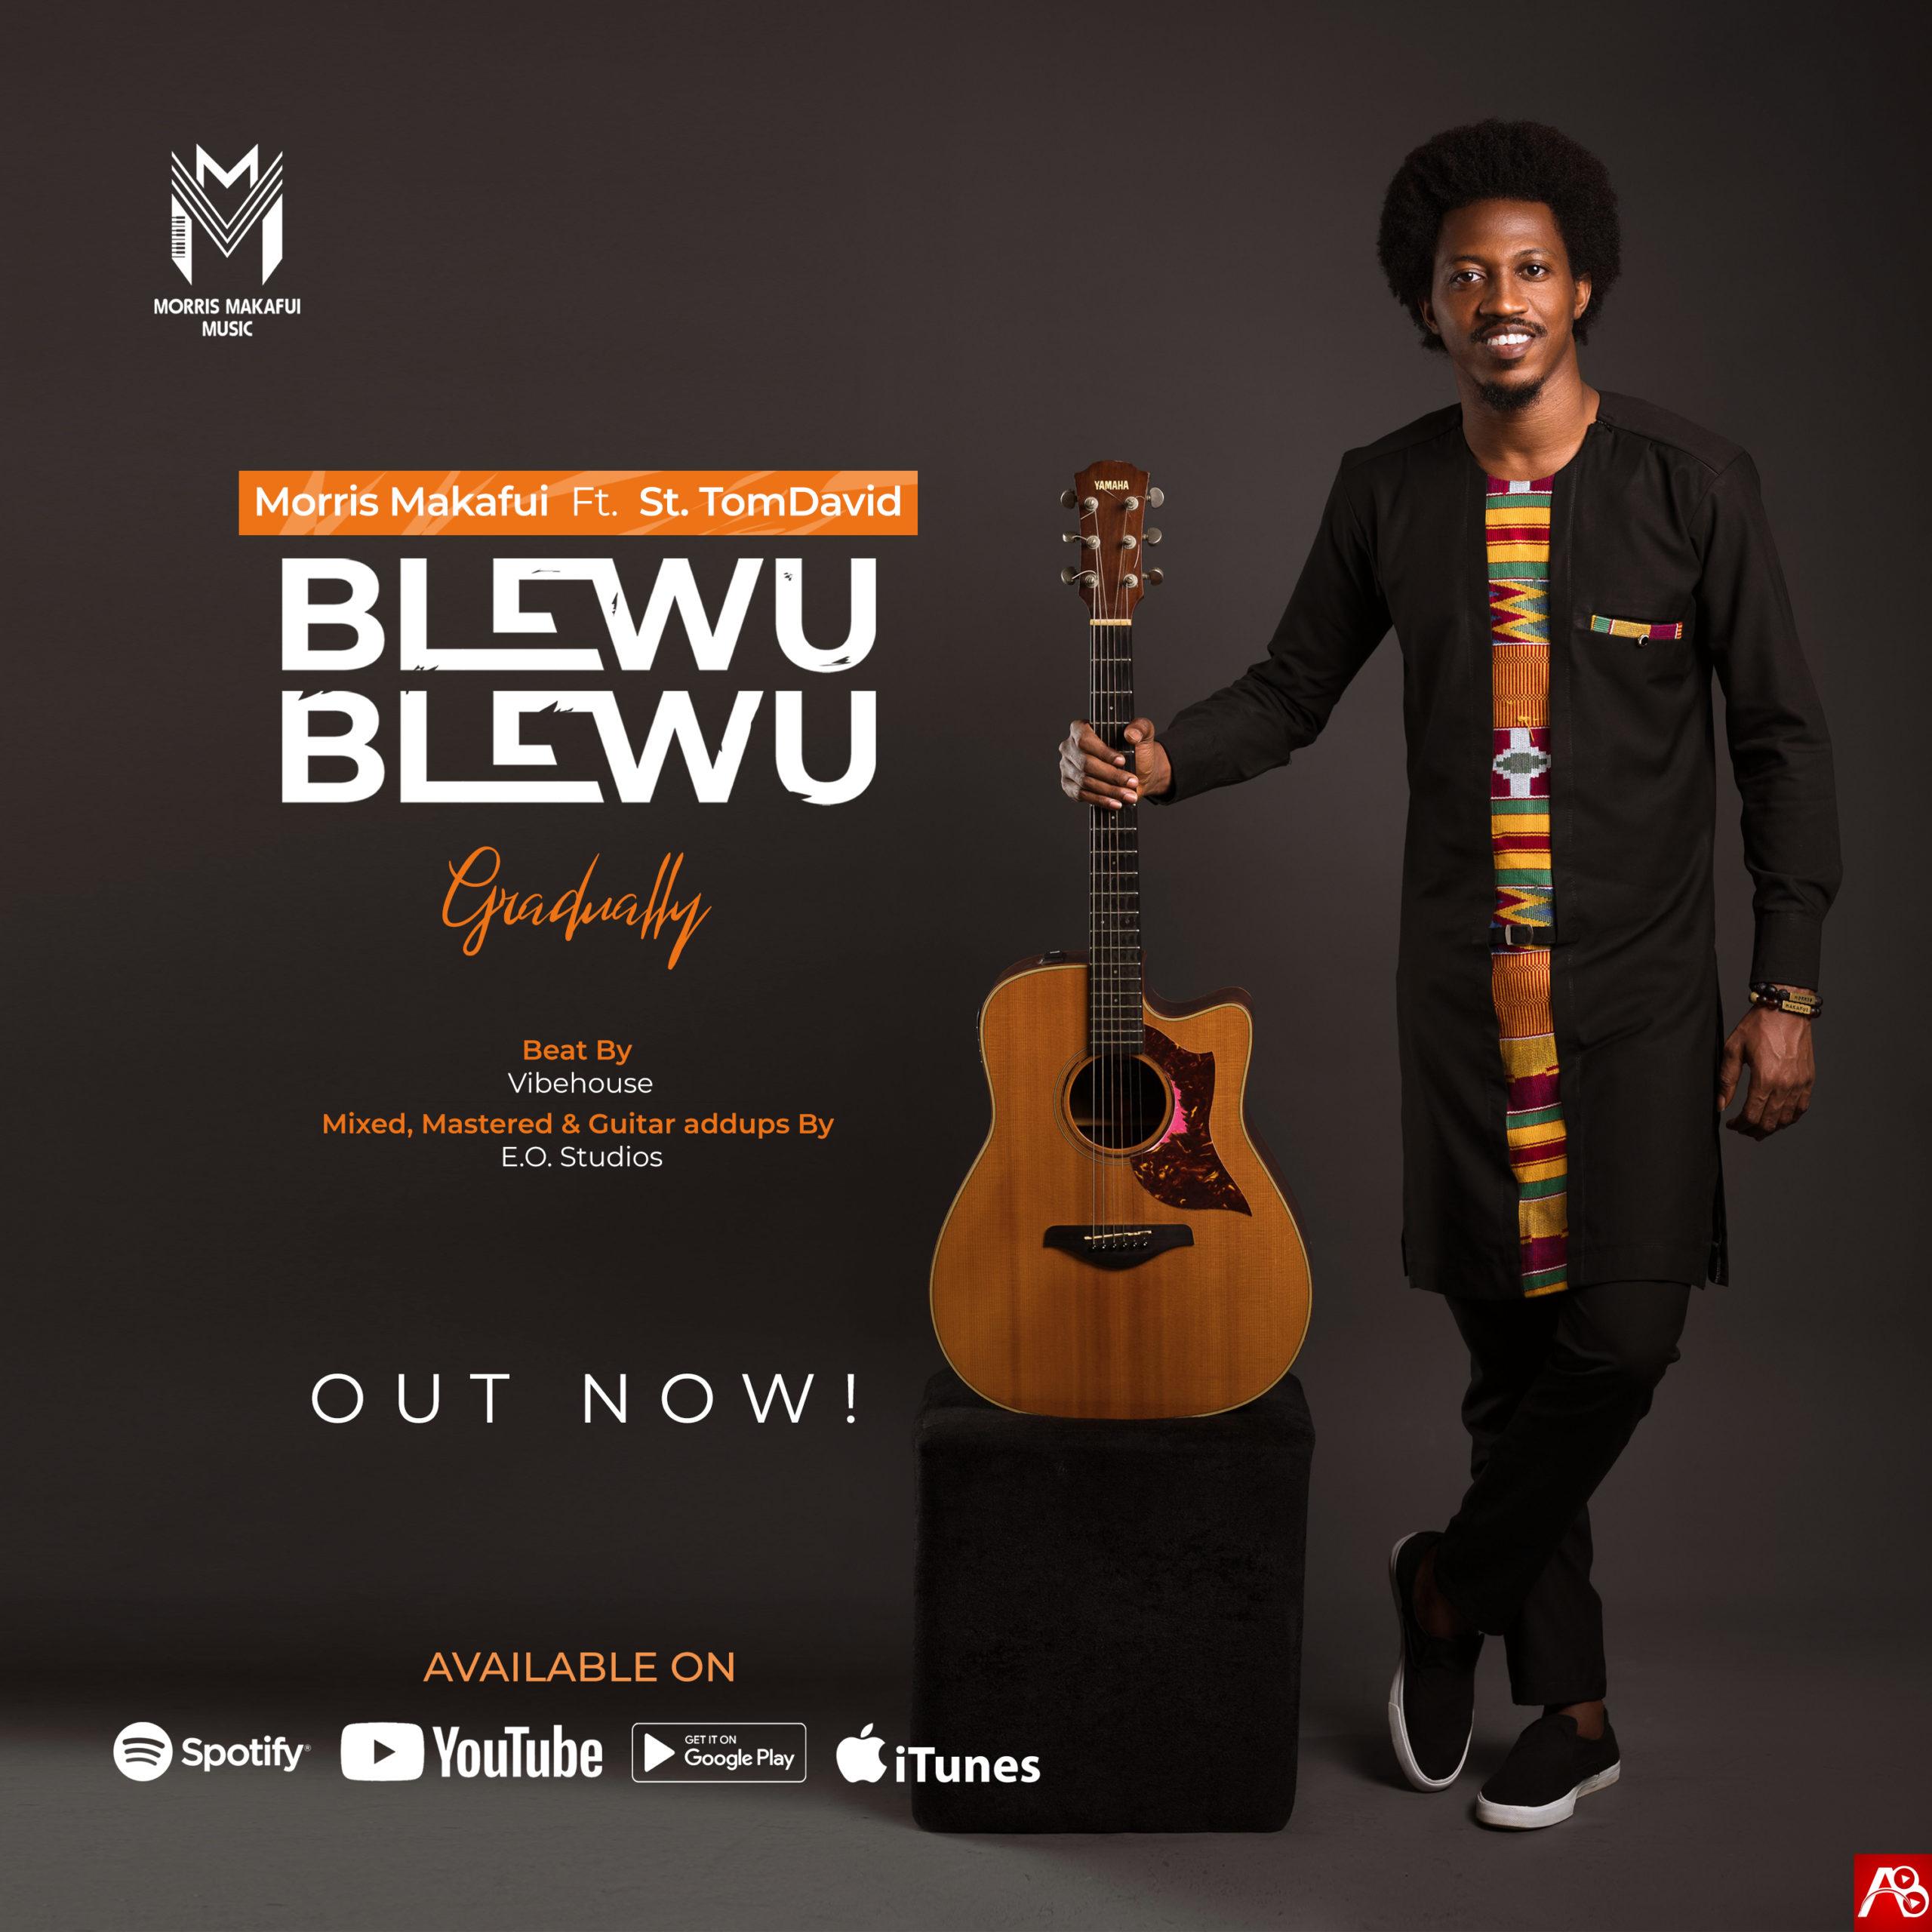 Morris Makafui - Blewu Blewu 'Gradually St. TomDavid